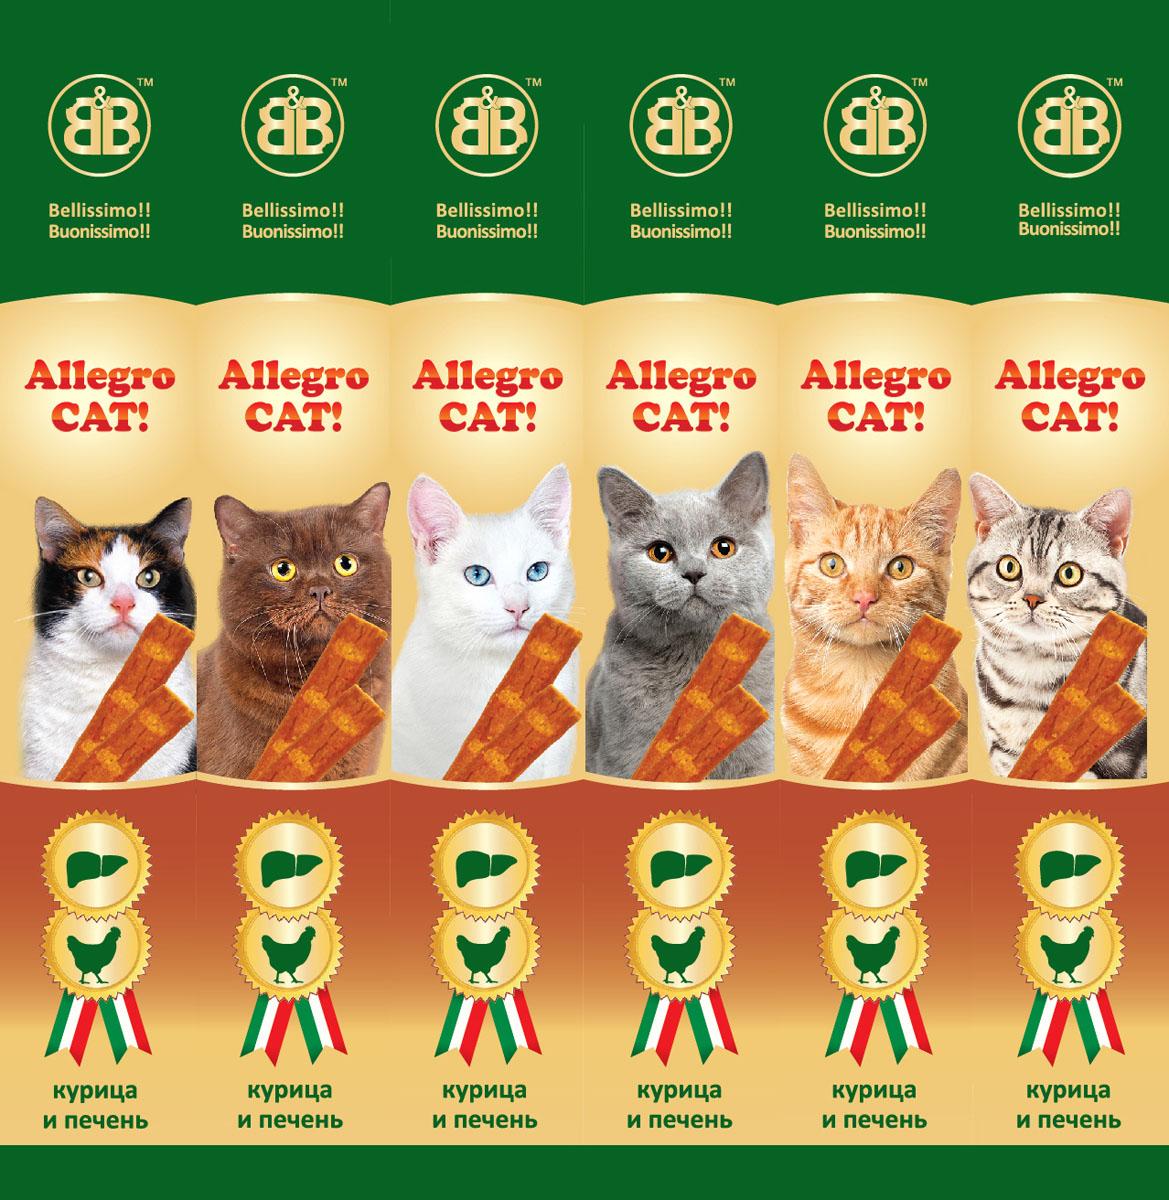 лакомство b&b allegro cat колбаски курица печень для кошек 6шт 36450 Лакомство для кошек B&B Allegro Cat, мясные колбаски из курицы и печени, 6х5 г